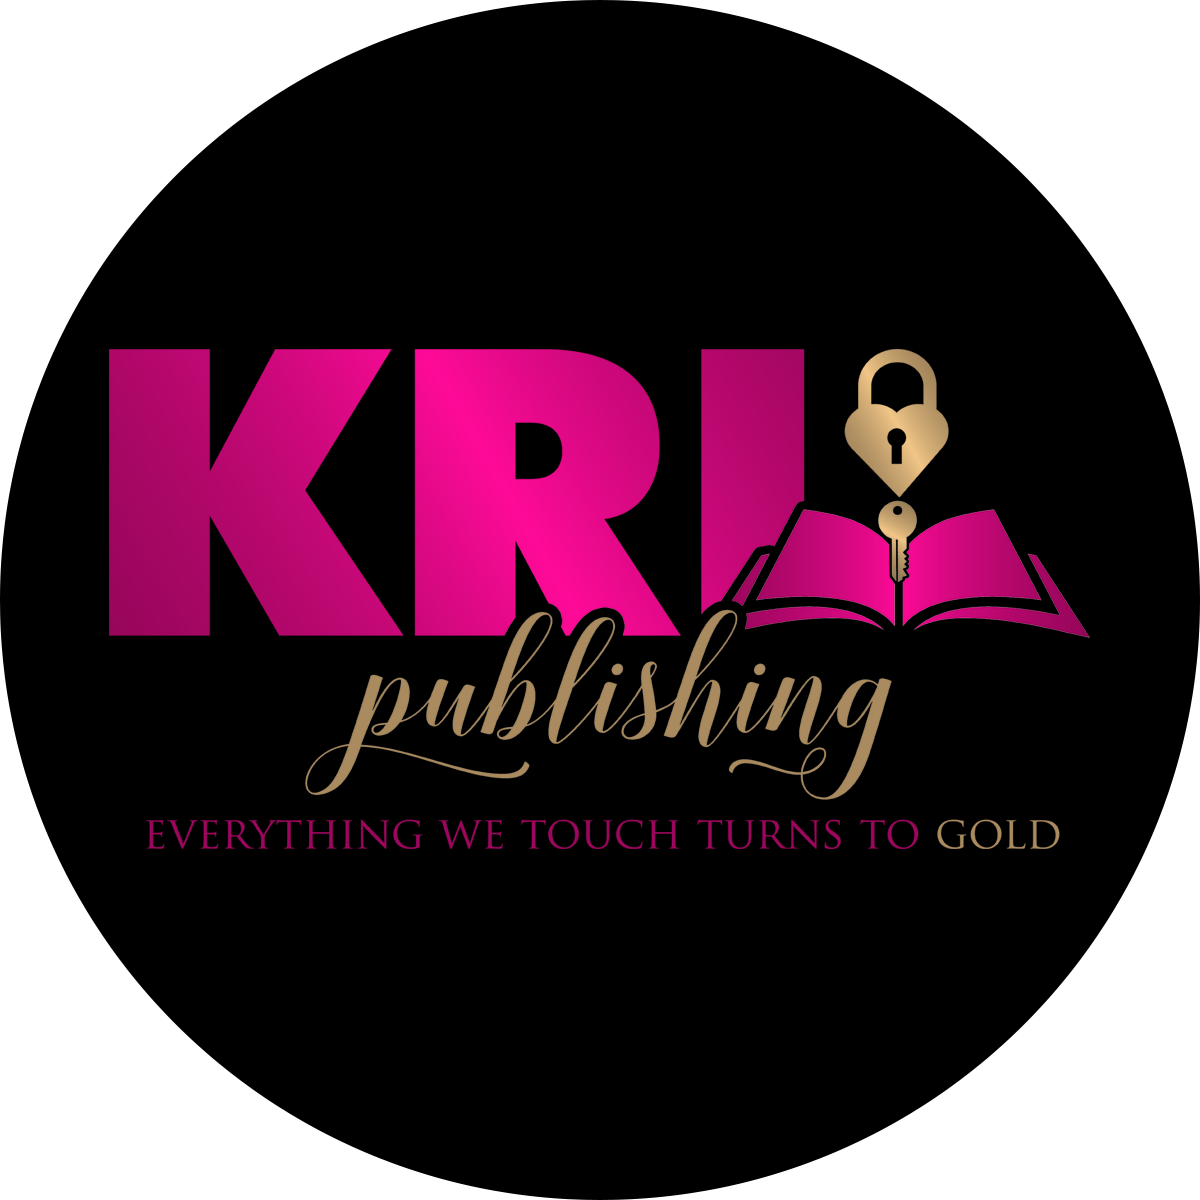 KRL-Publishing